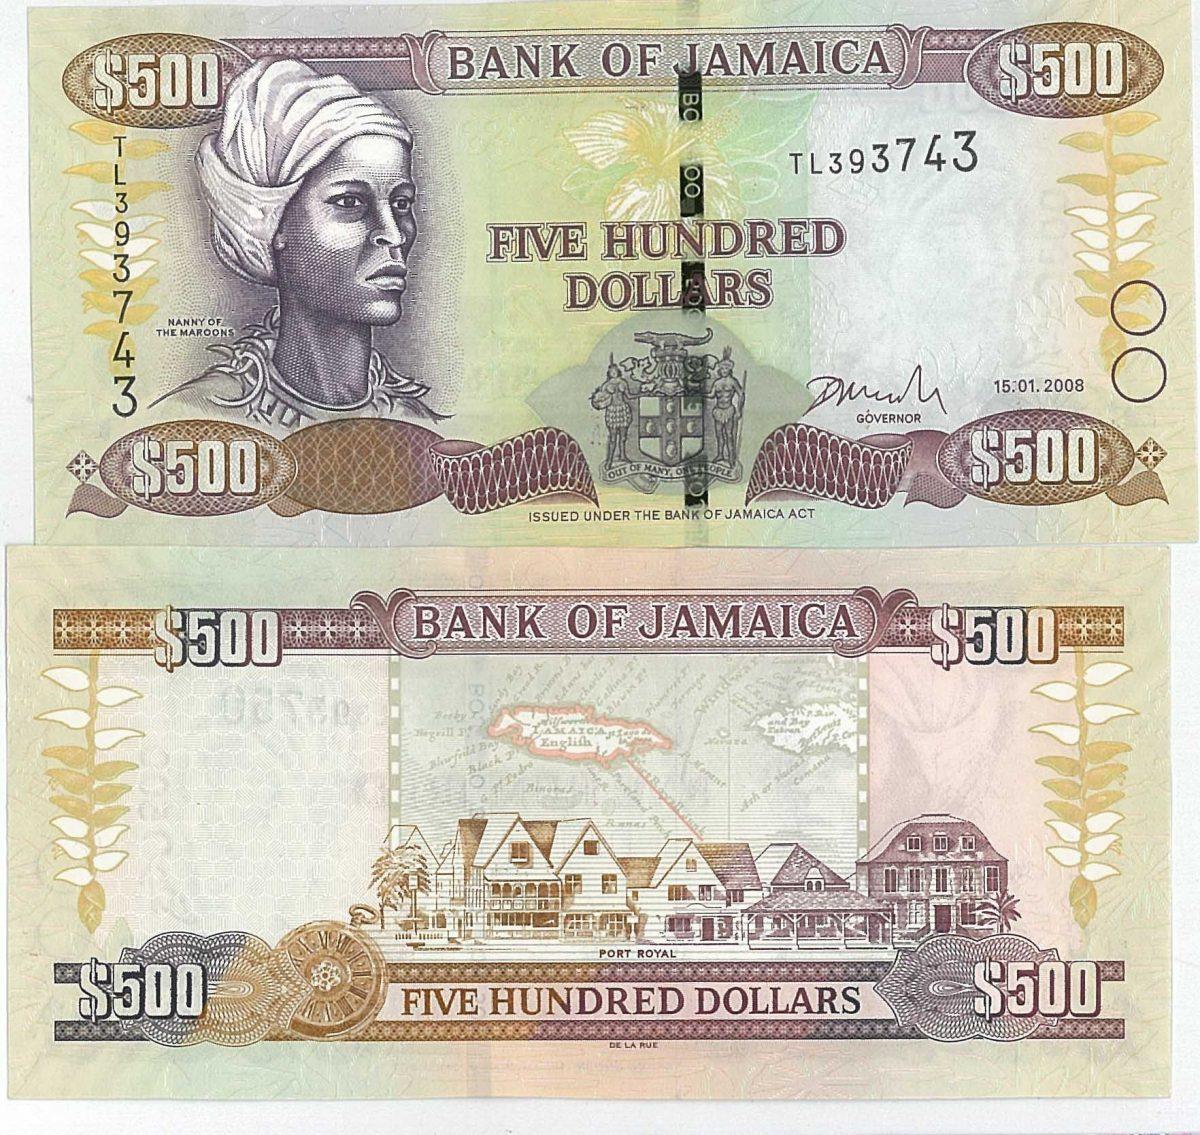 Billete de 500 dólares de Jamaica